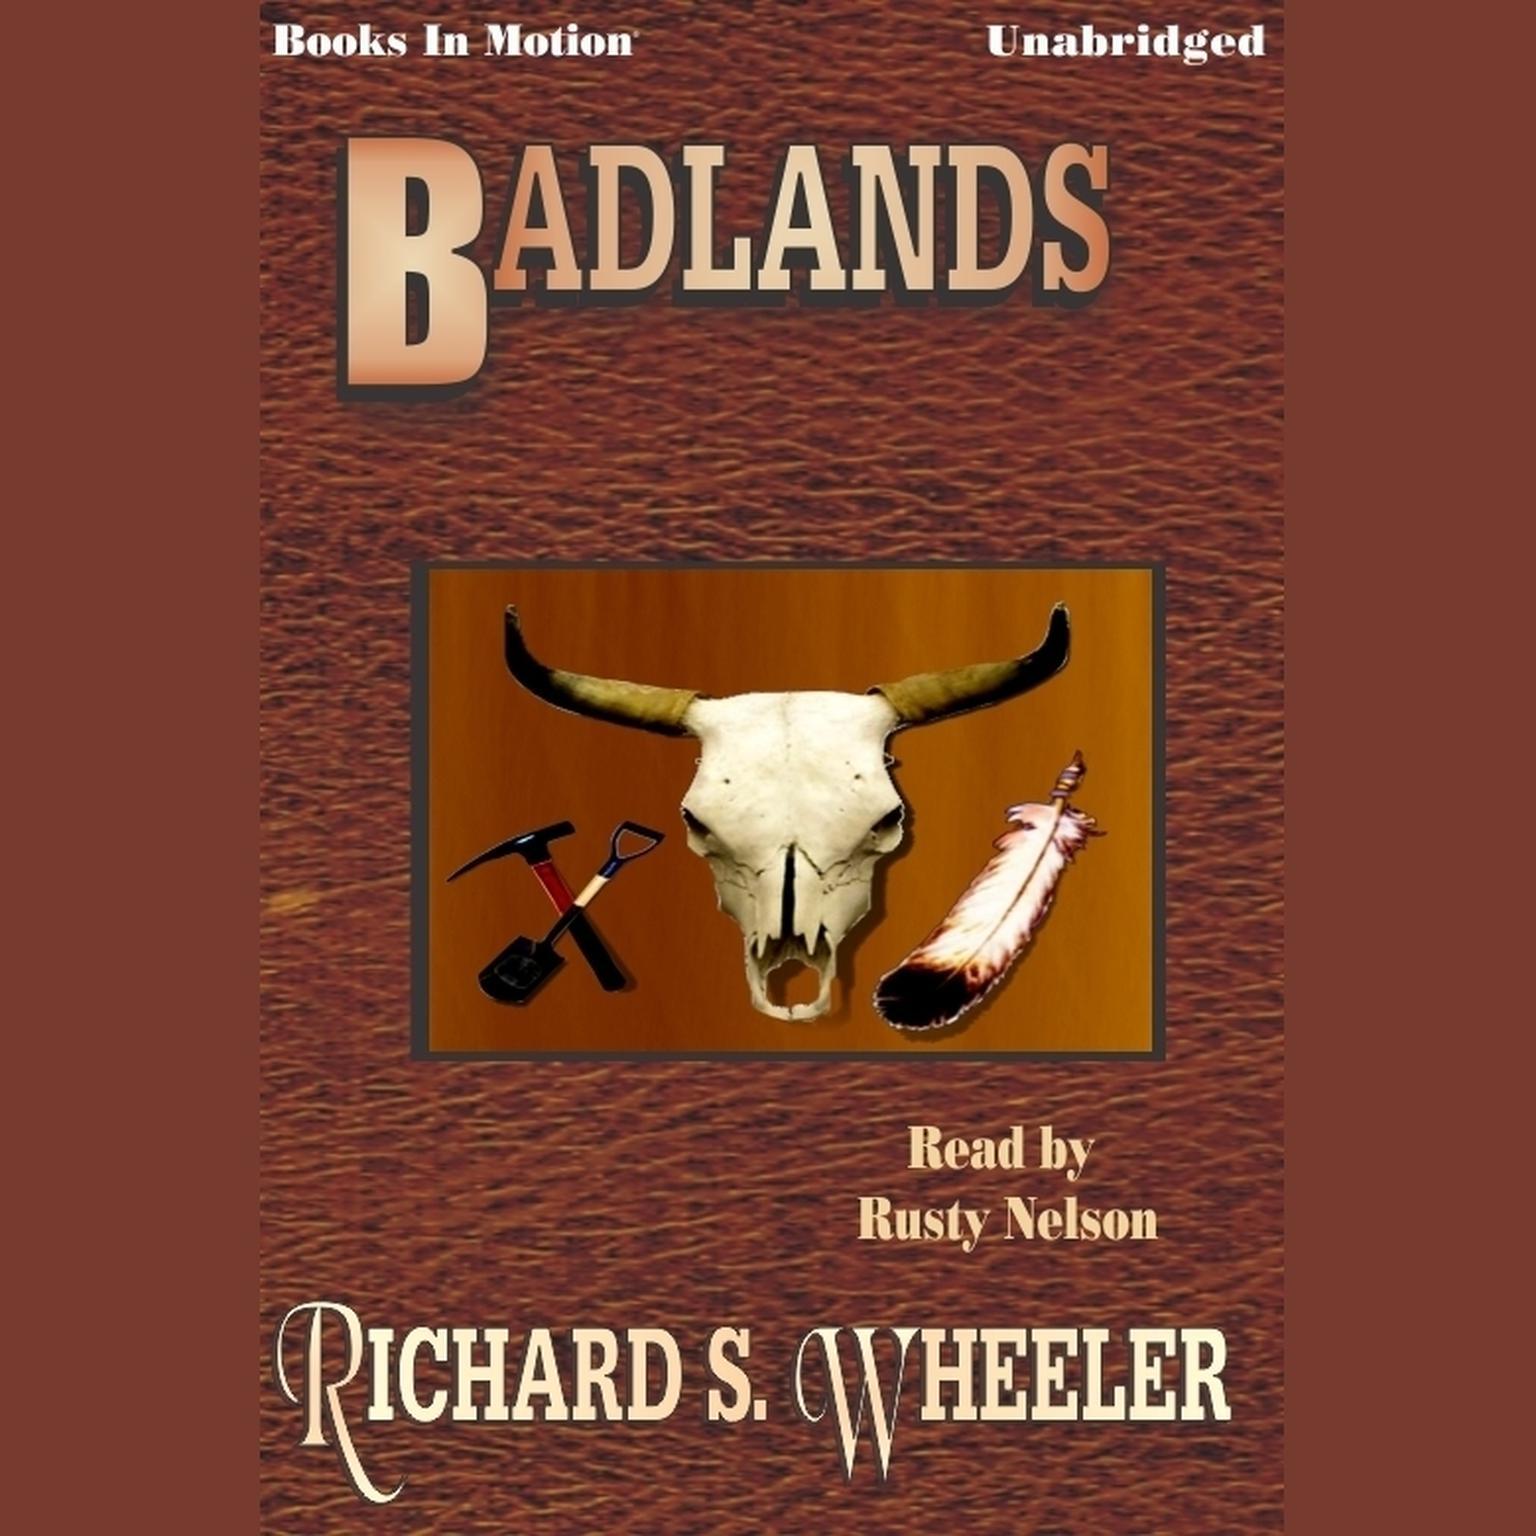 Badlands Audiobook, by Richard S. Wheeler